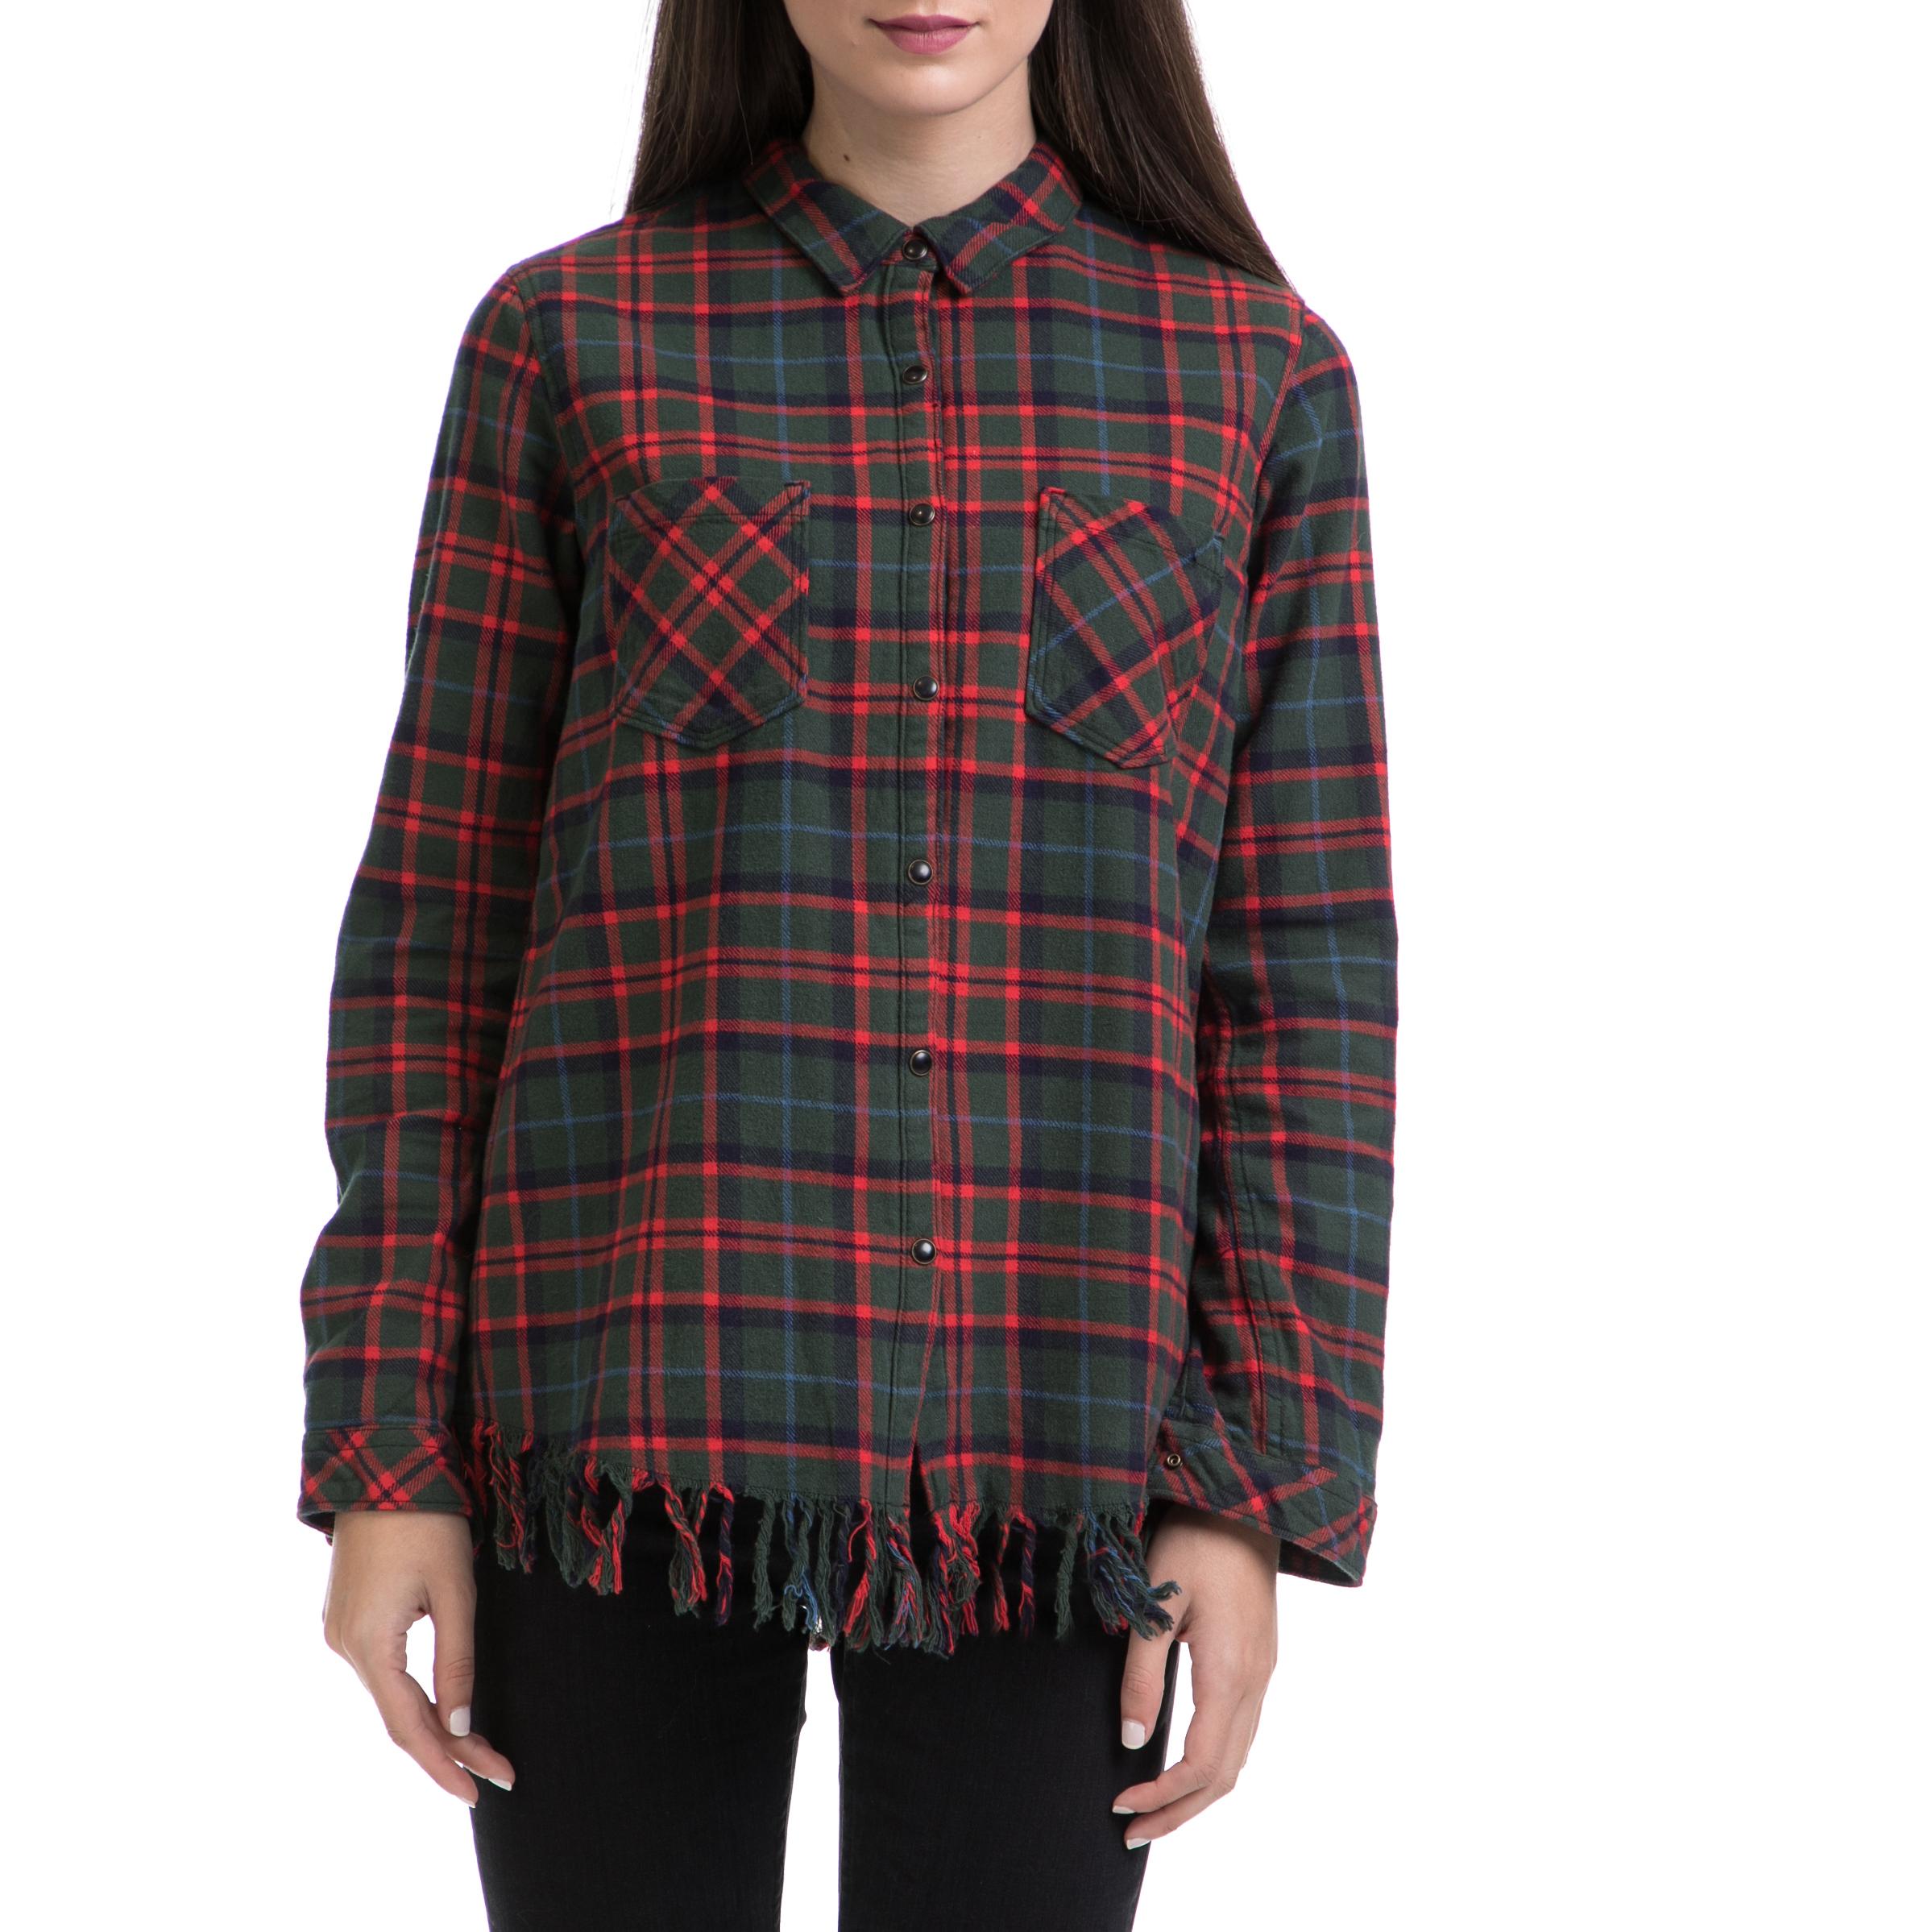 SCOTCH & SODA - Γυναικείο πουκάμισο MAISON SCOTCH κόκκινο-πράσινο γυναικεία ρούχα πουκάμισα μακρυμάνικα